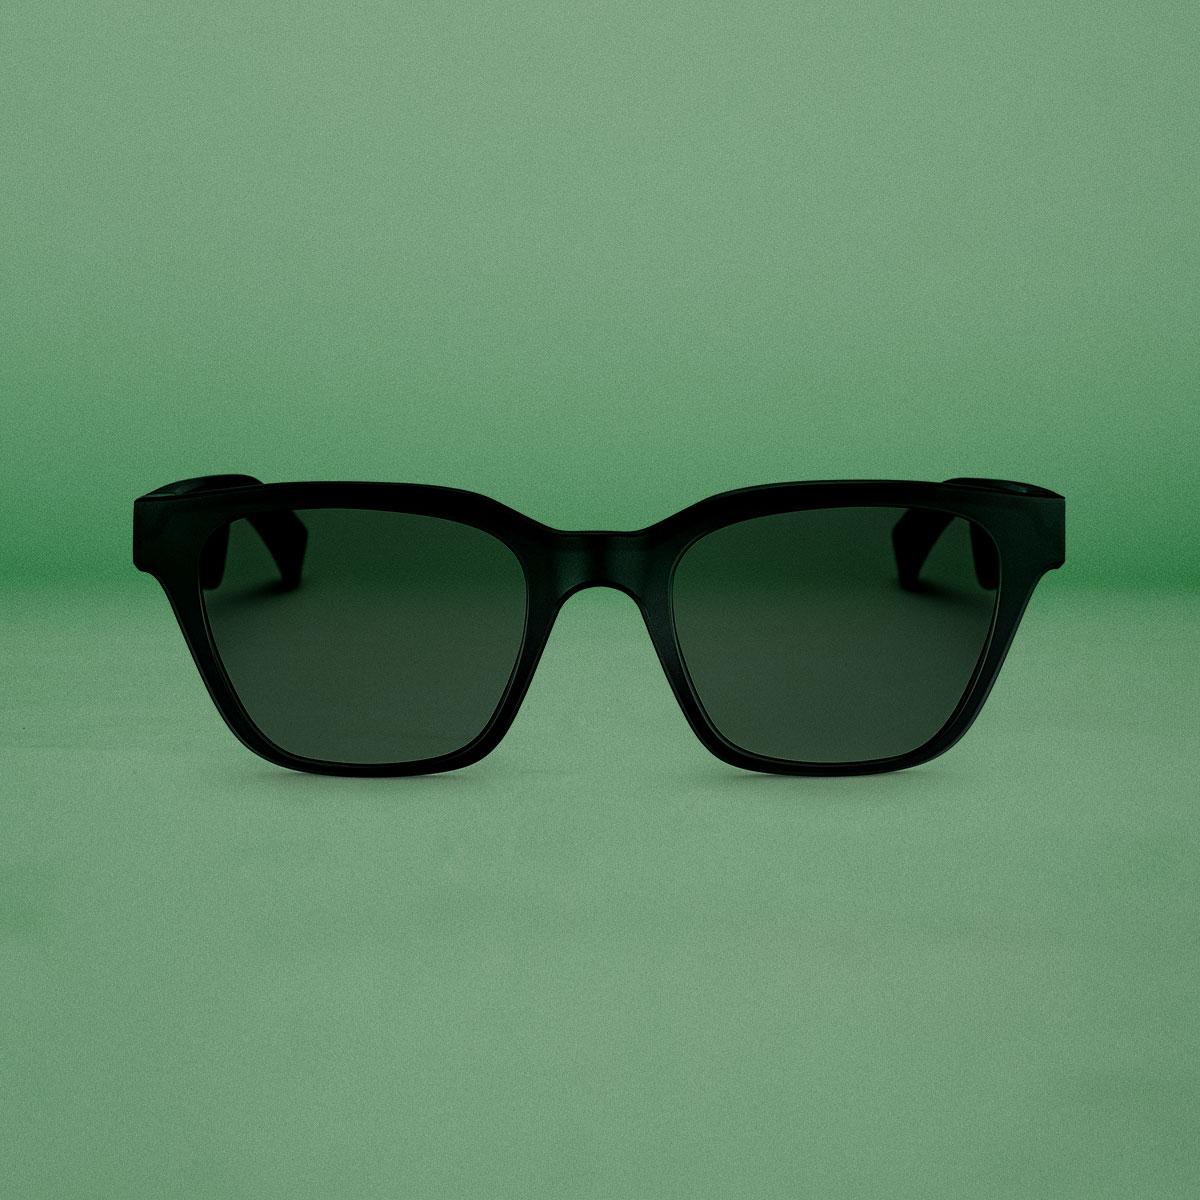 pcr-camproof-sunglasses-1200x1200px.jpg